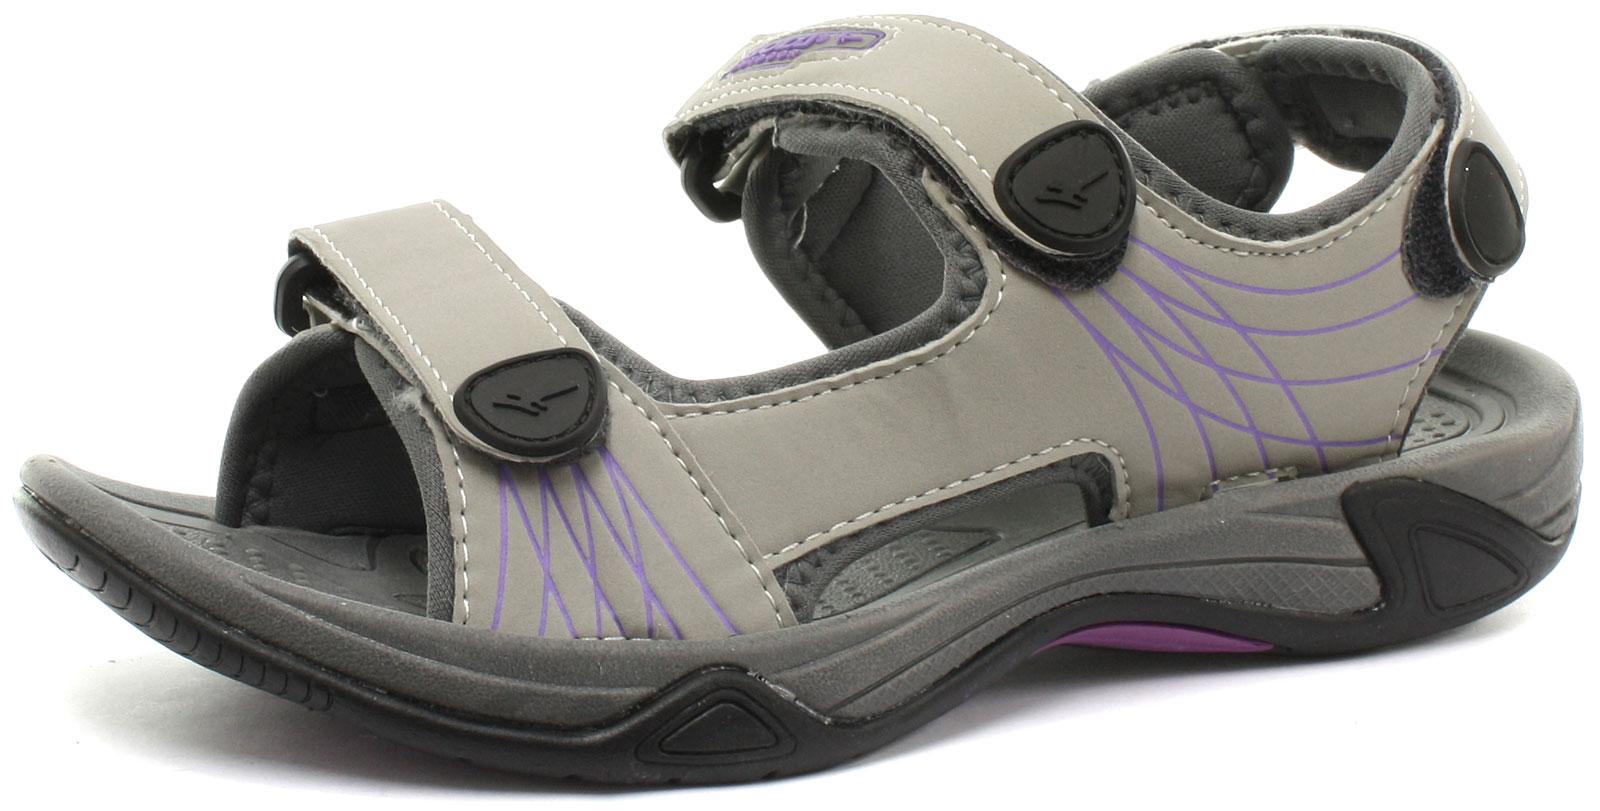 Excellent  Womens Footwear Amp Accessories  Sportstar Women39s Trekking